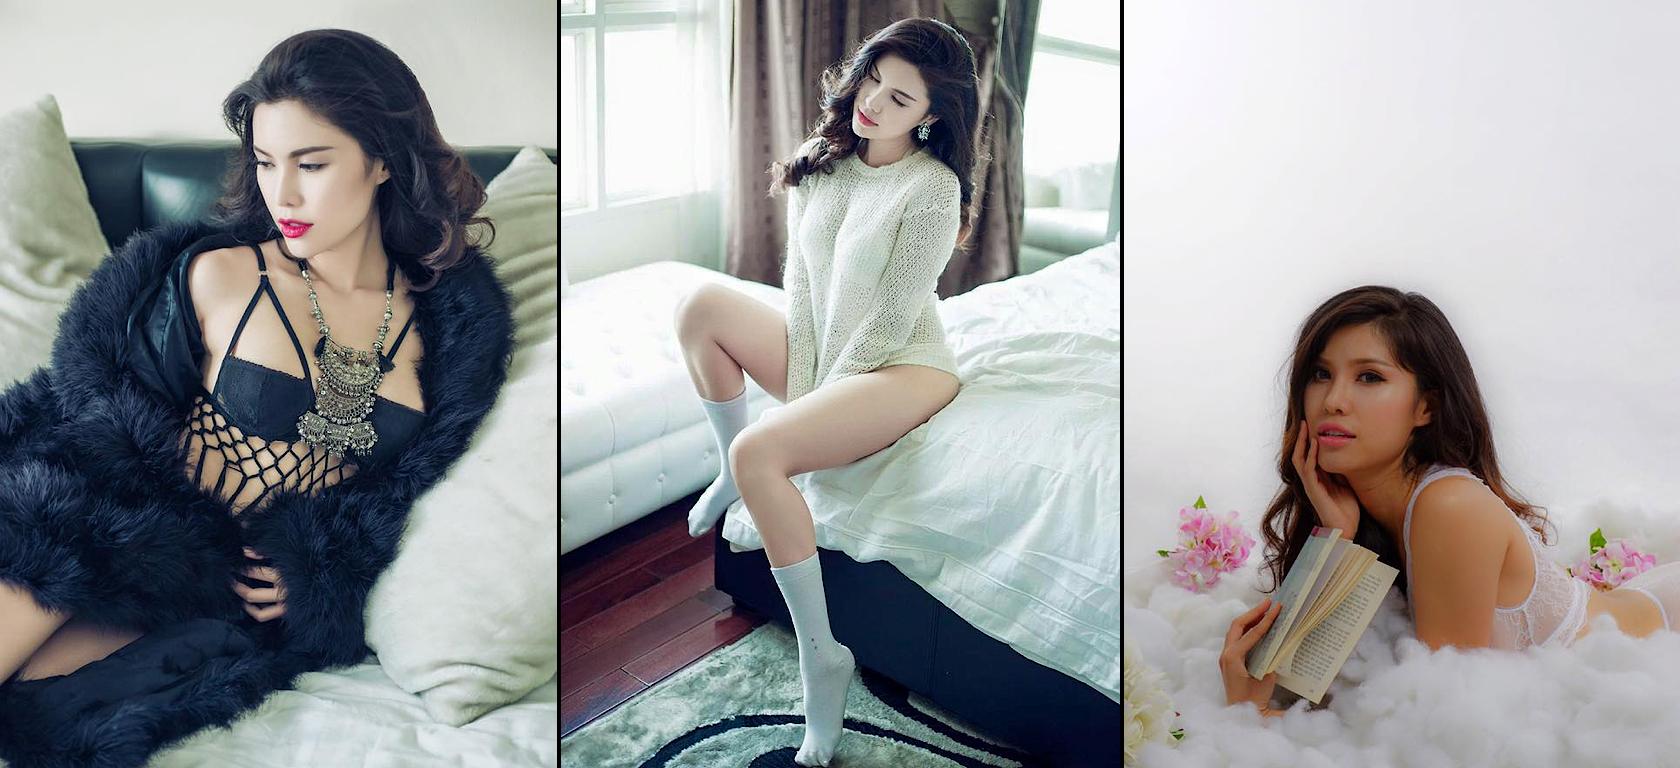 pg-nguoi-mau-model-bui-kim-my